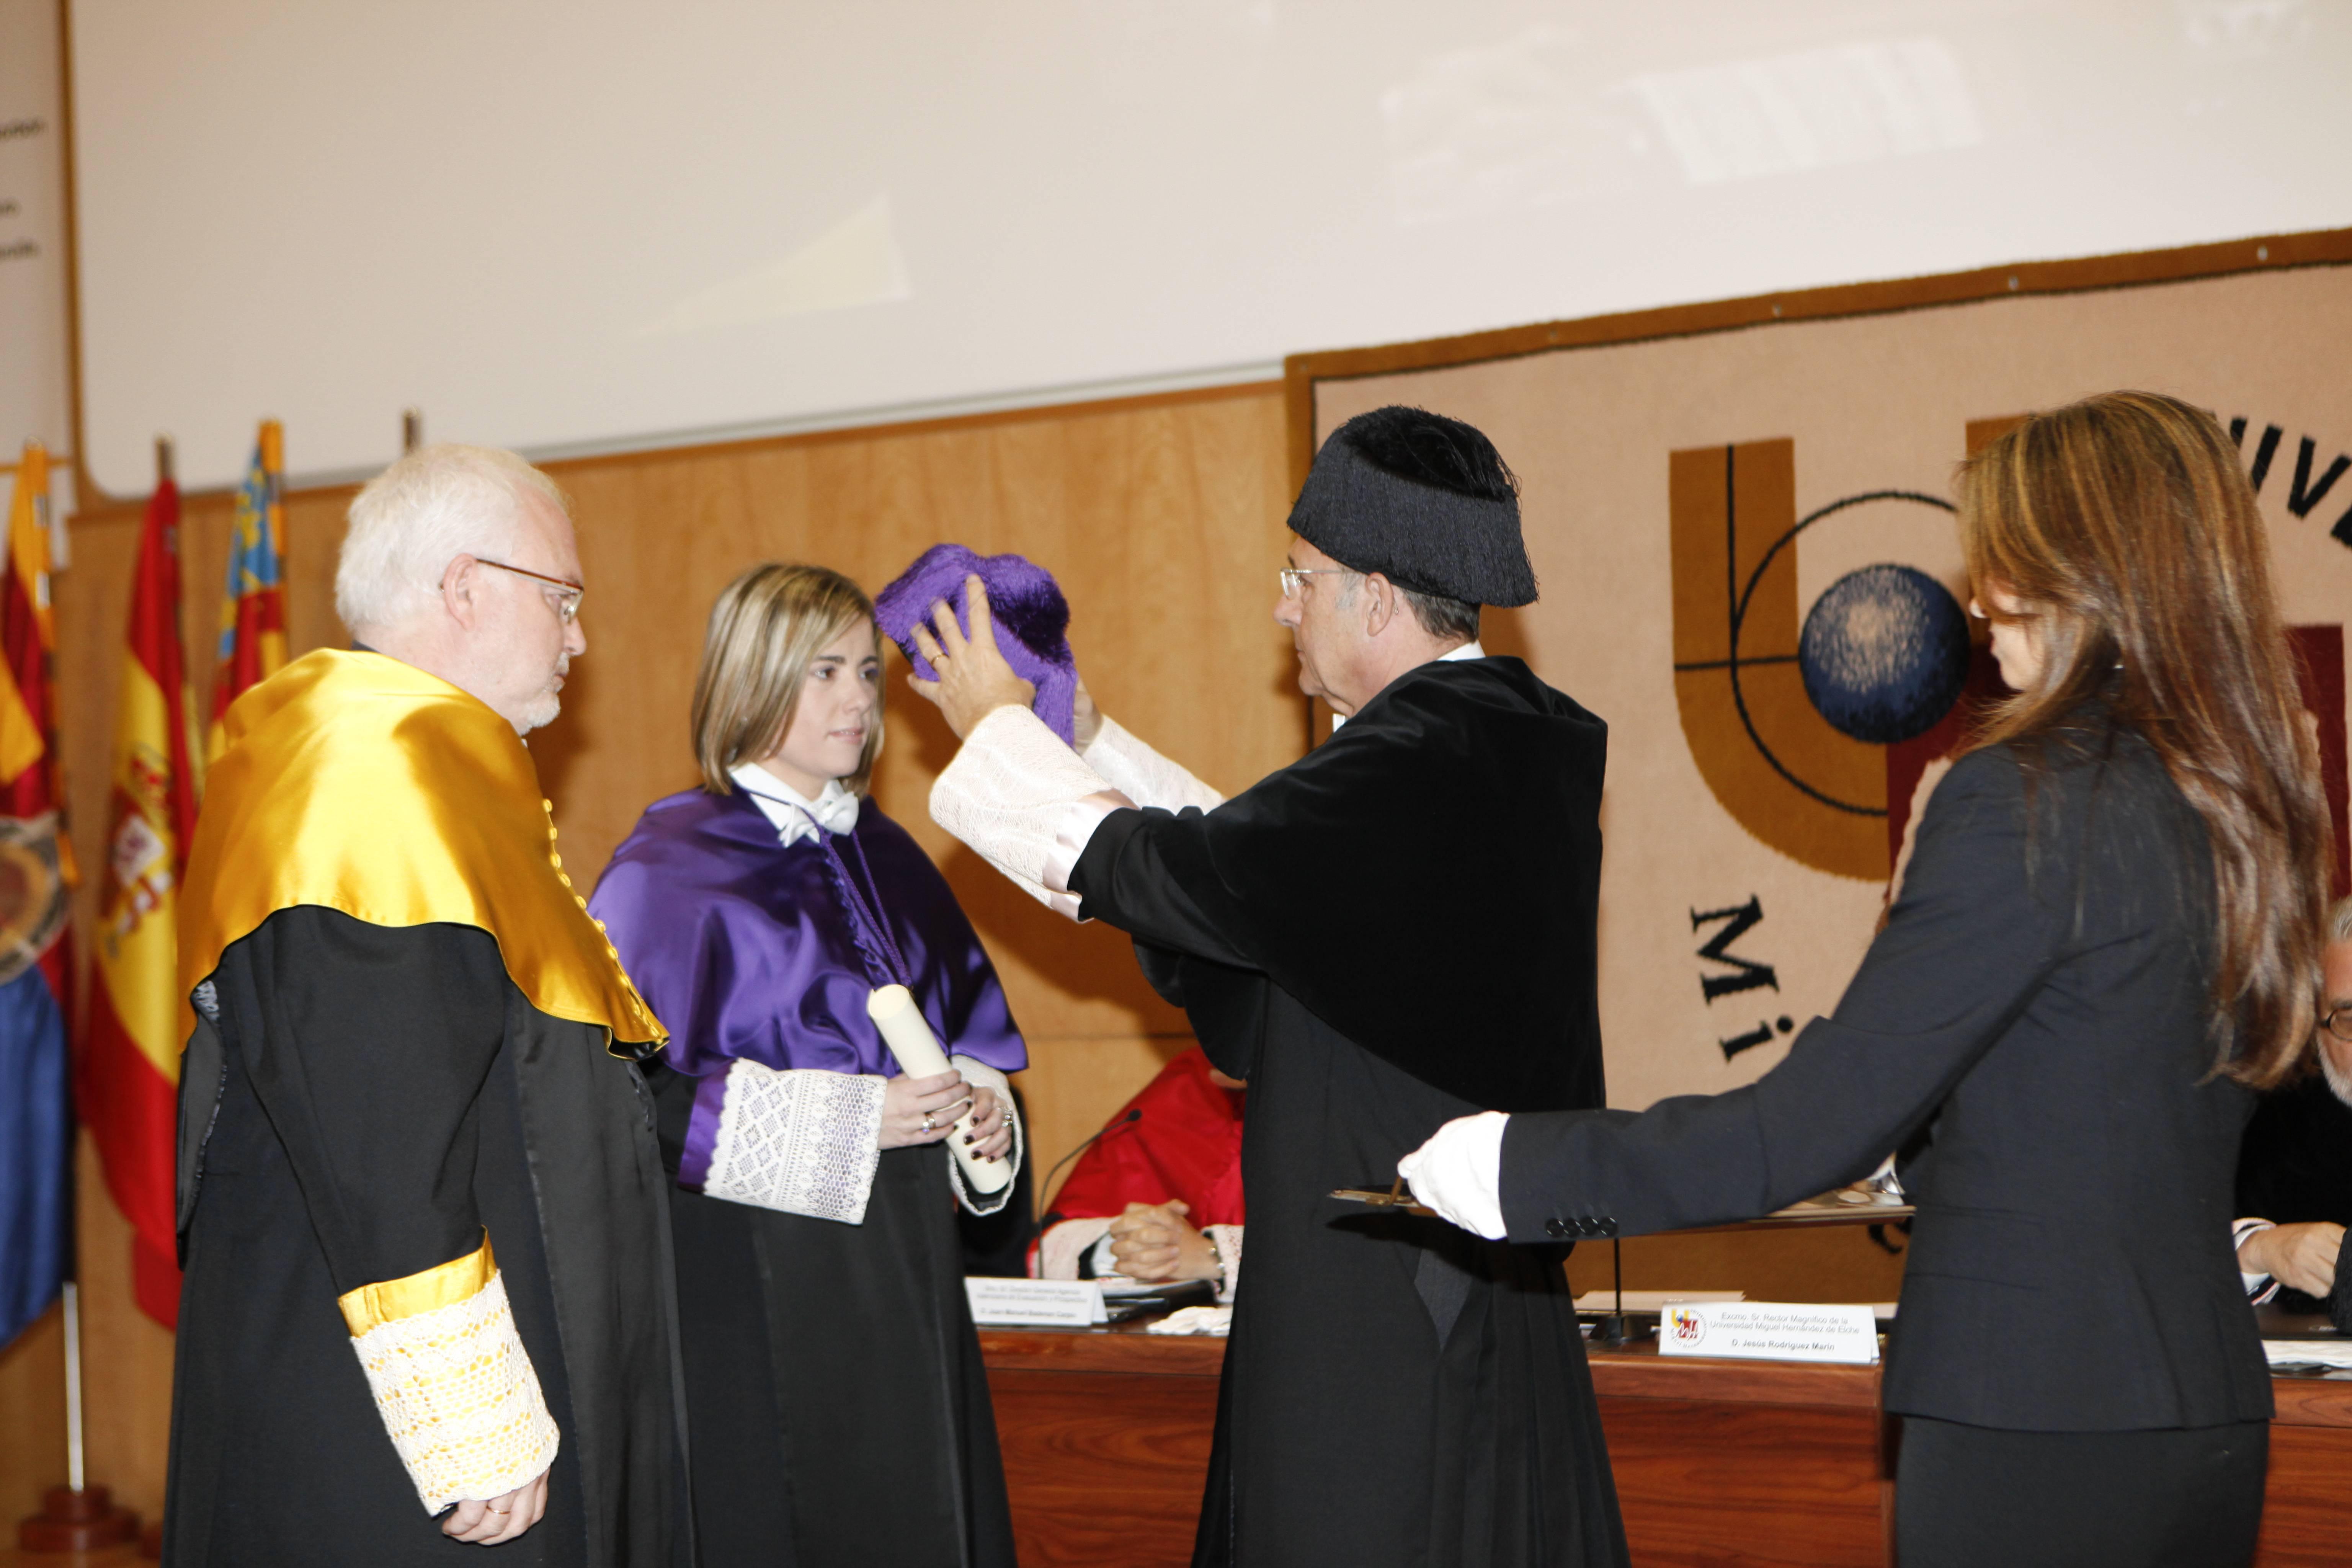 doctor-honoris-causa-luis-gamir_mg_1110.jpg